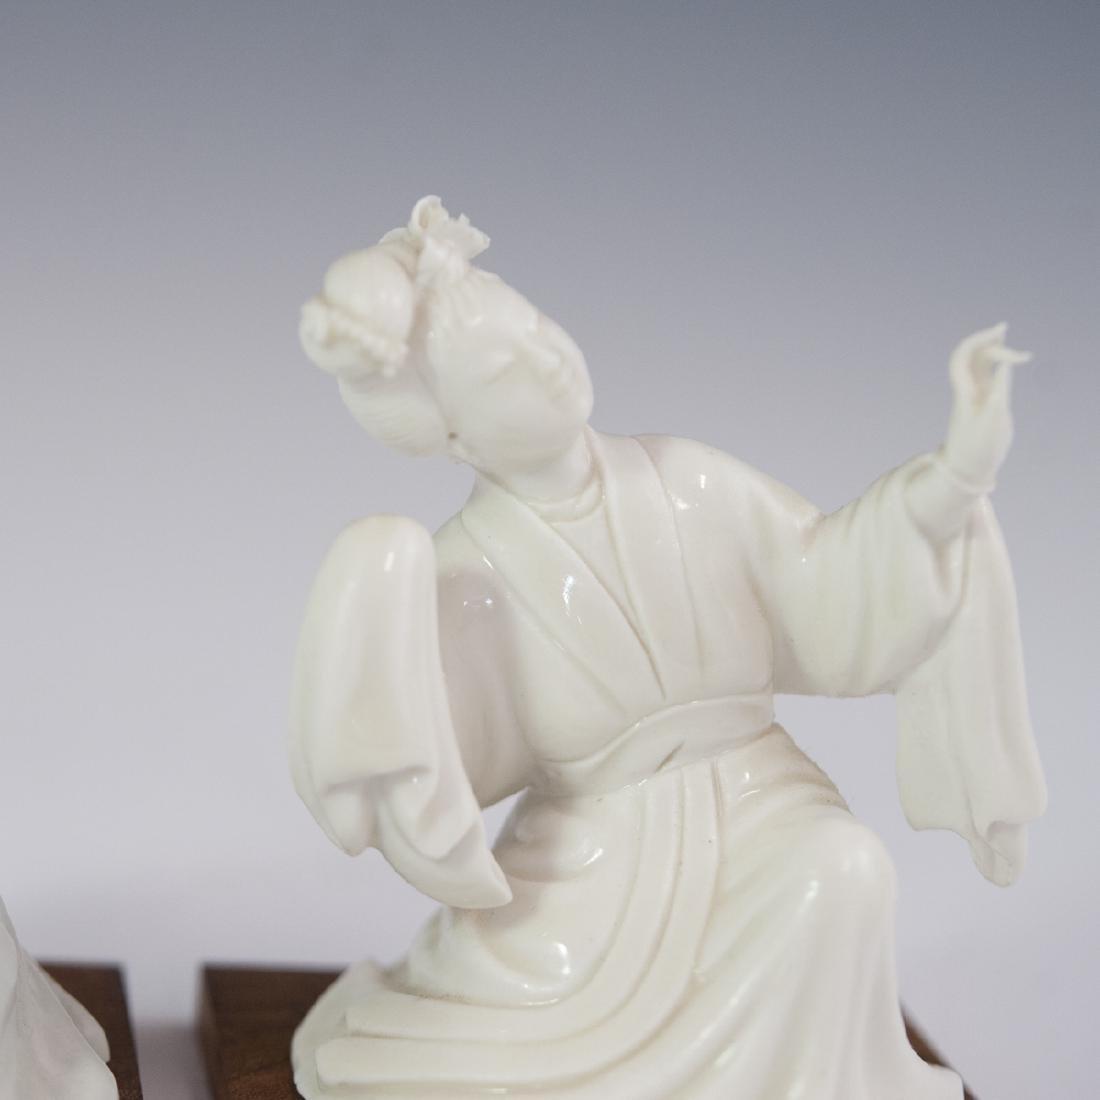 Chinese Blanc De Chine Figurines - 3